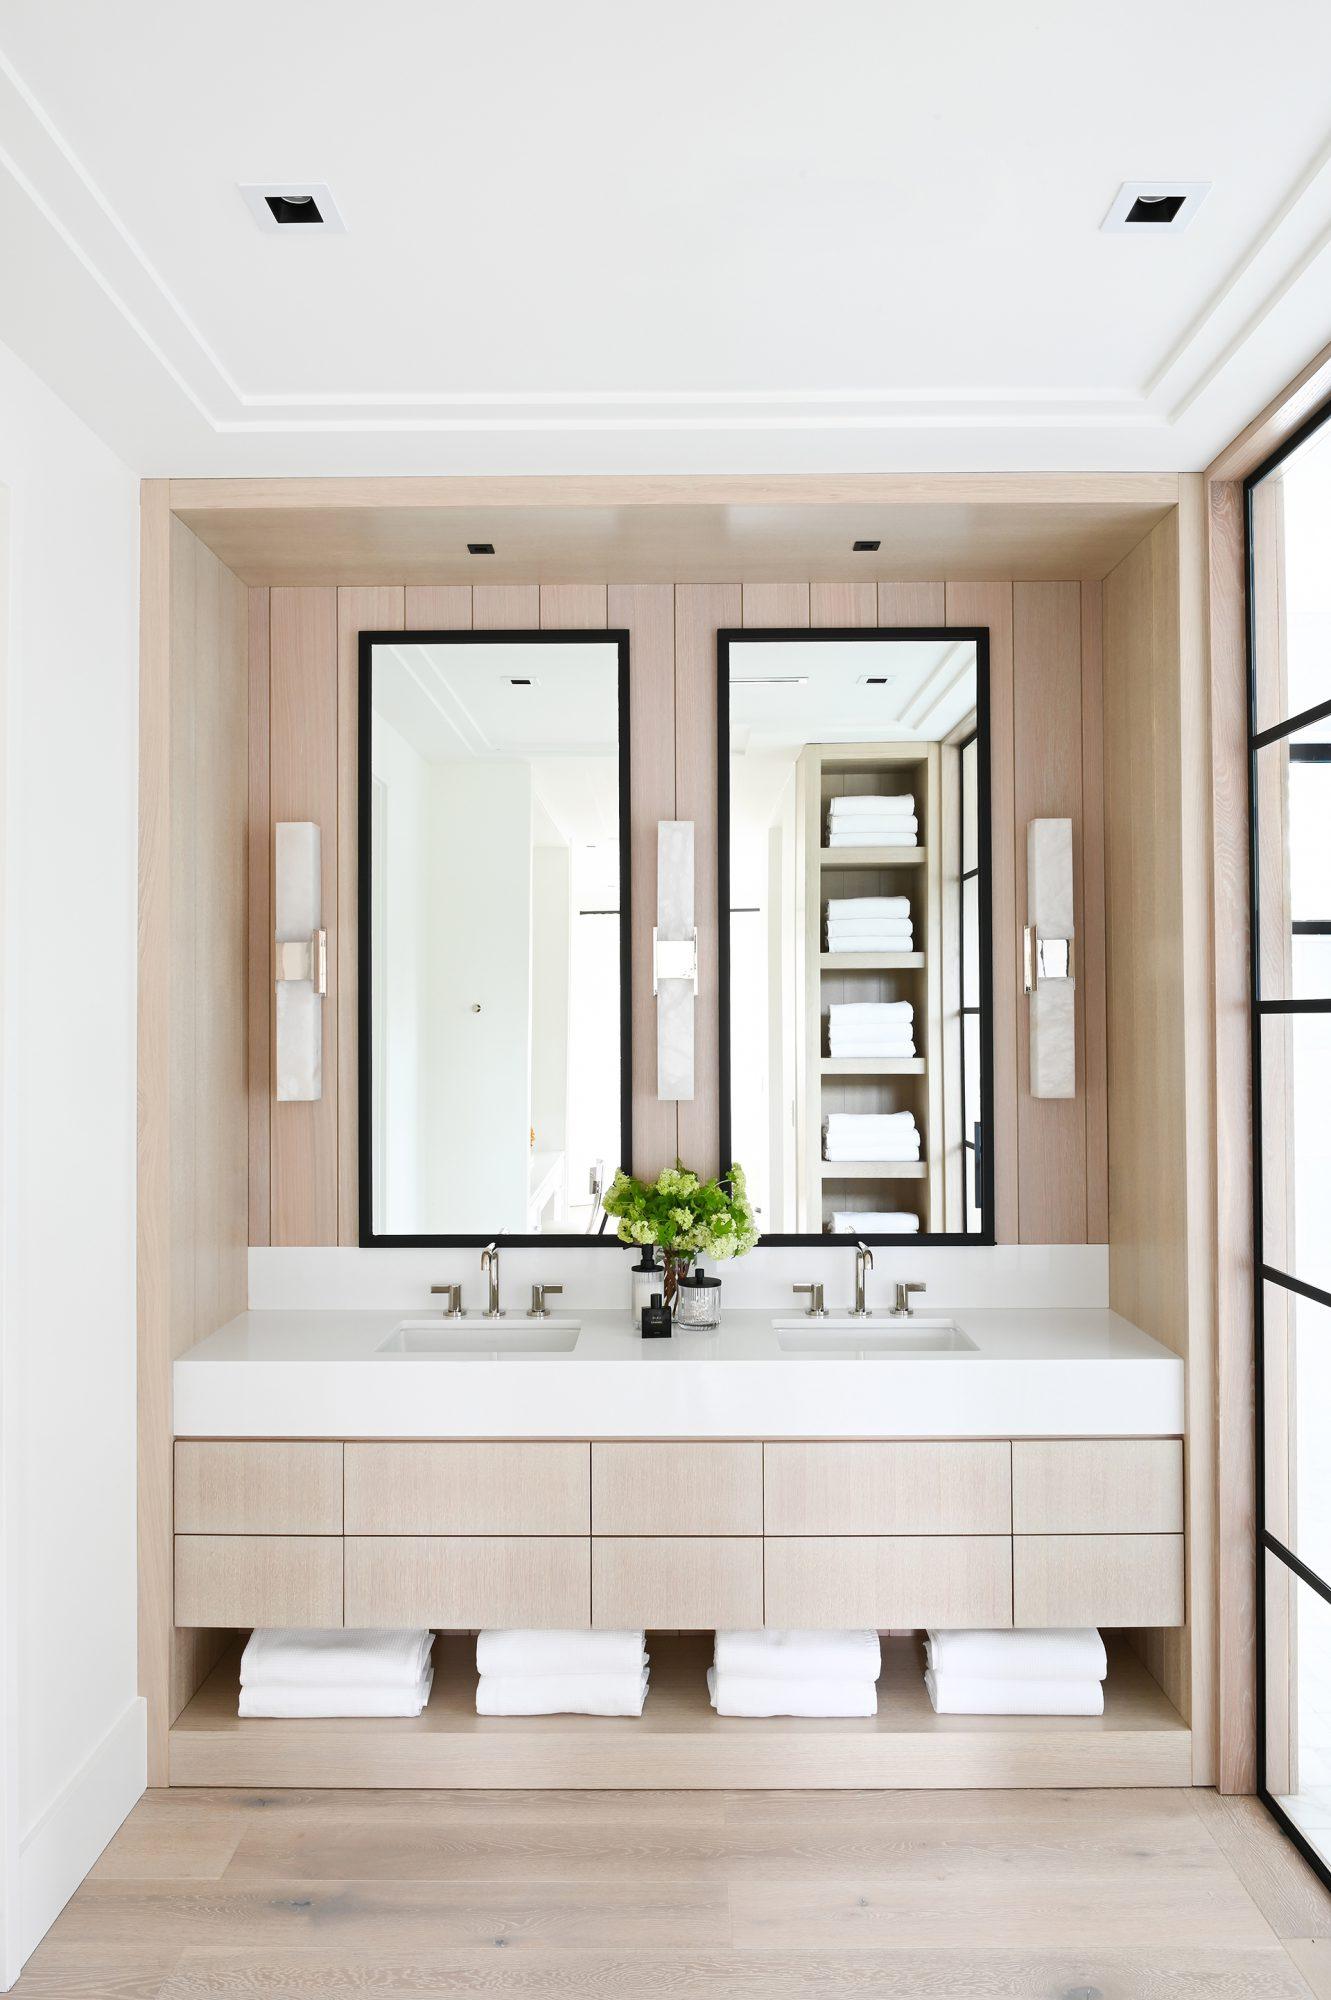 Ferme Moderne bathroom built by Midland Premium Properties in Vancouver, BC